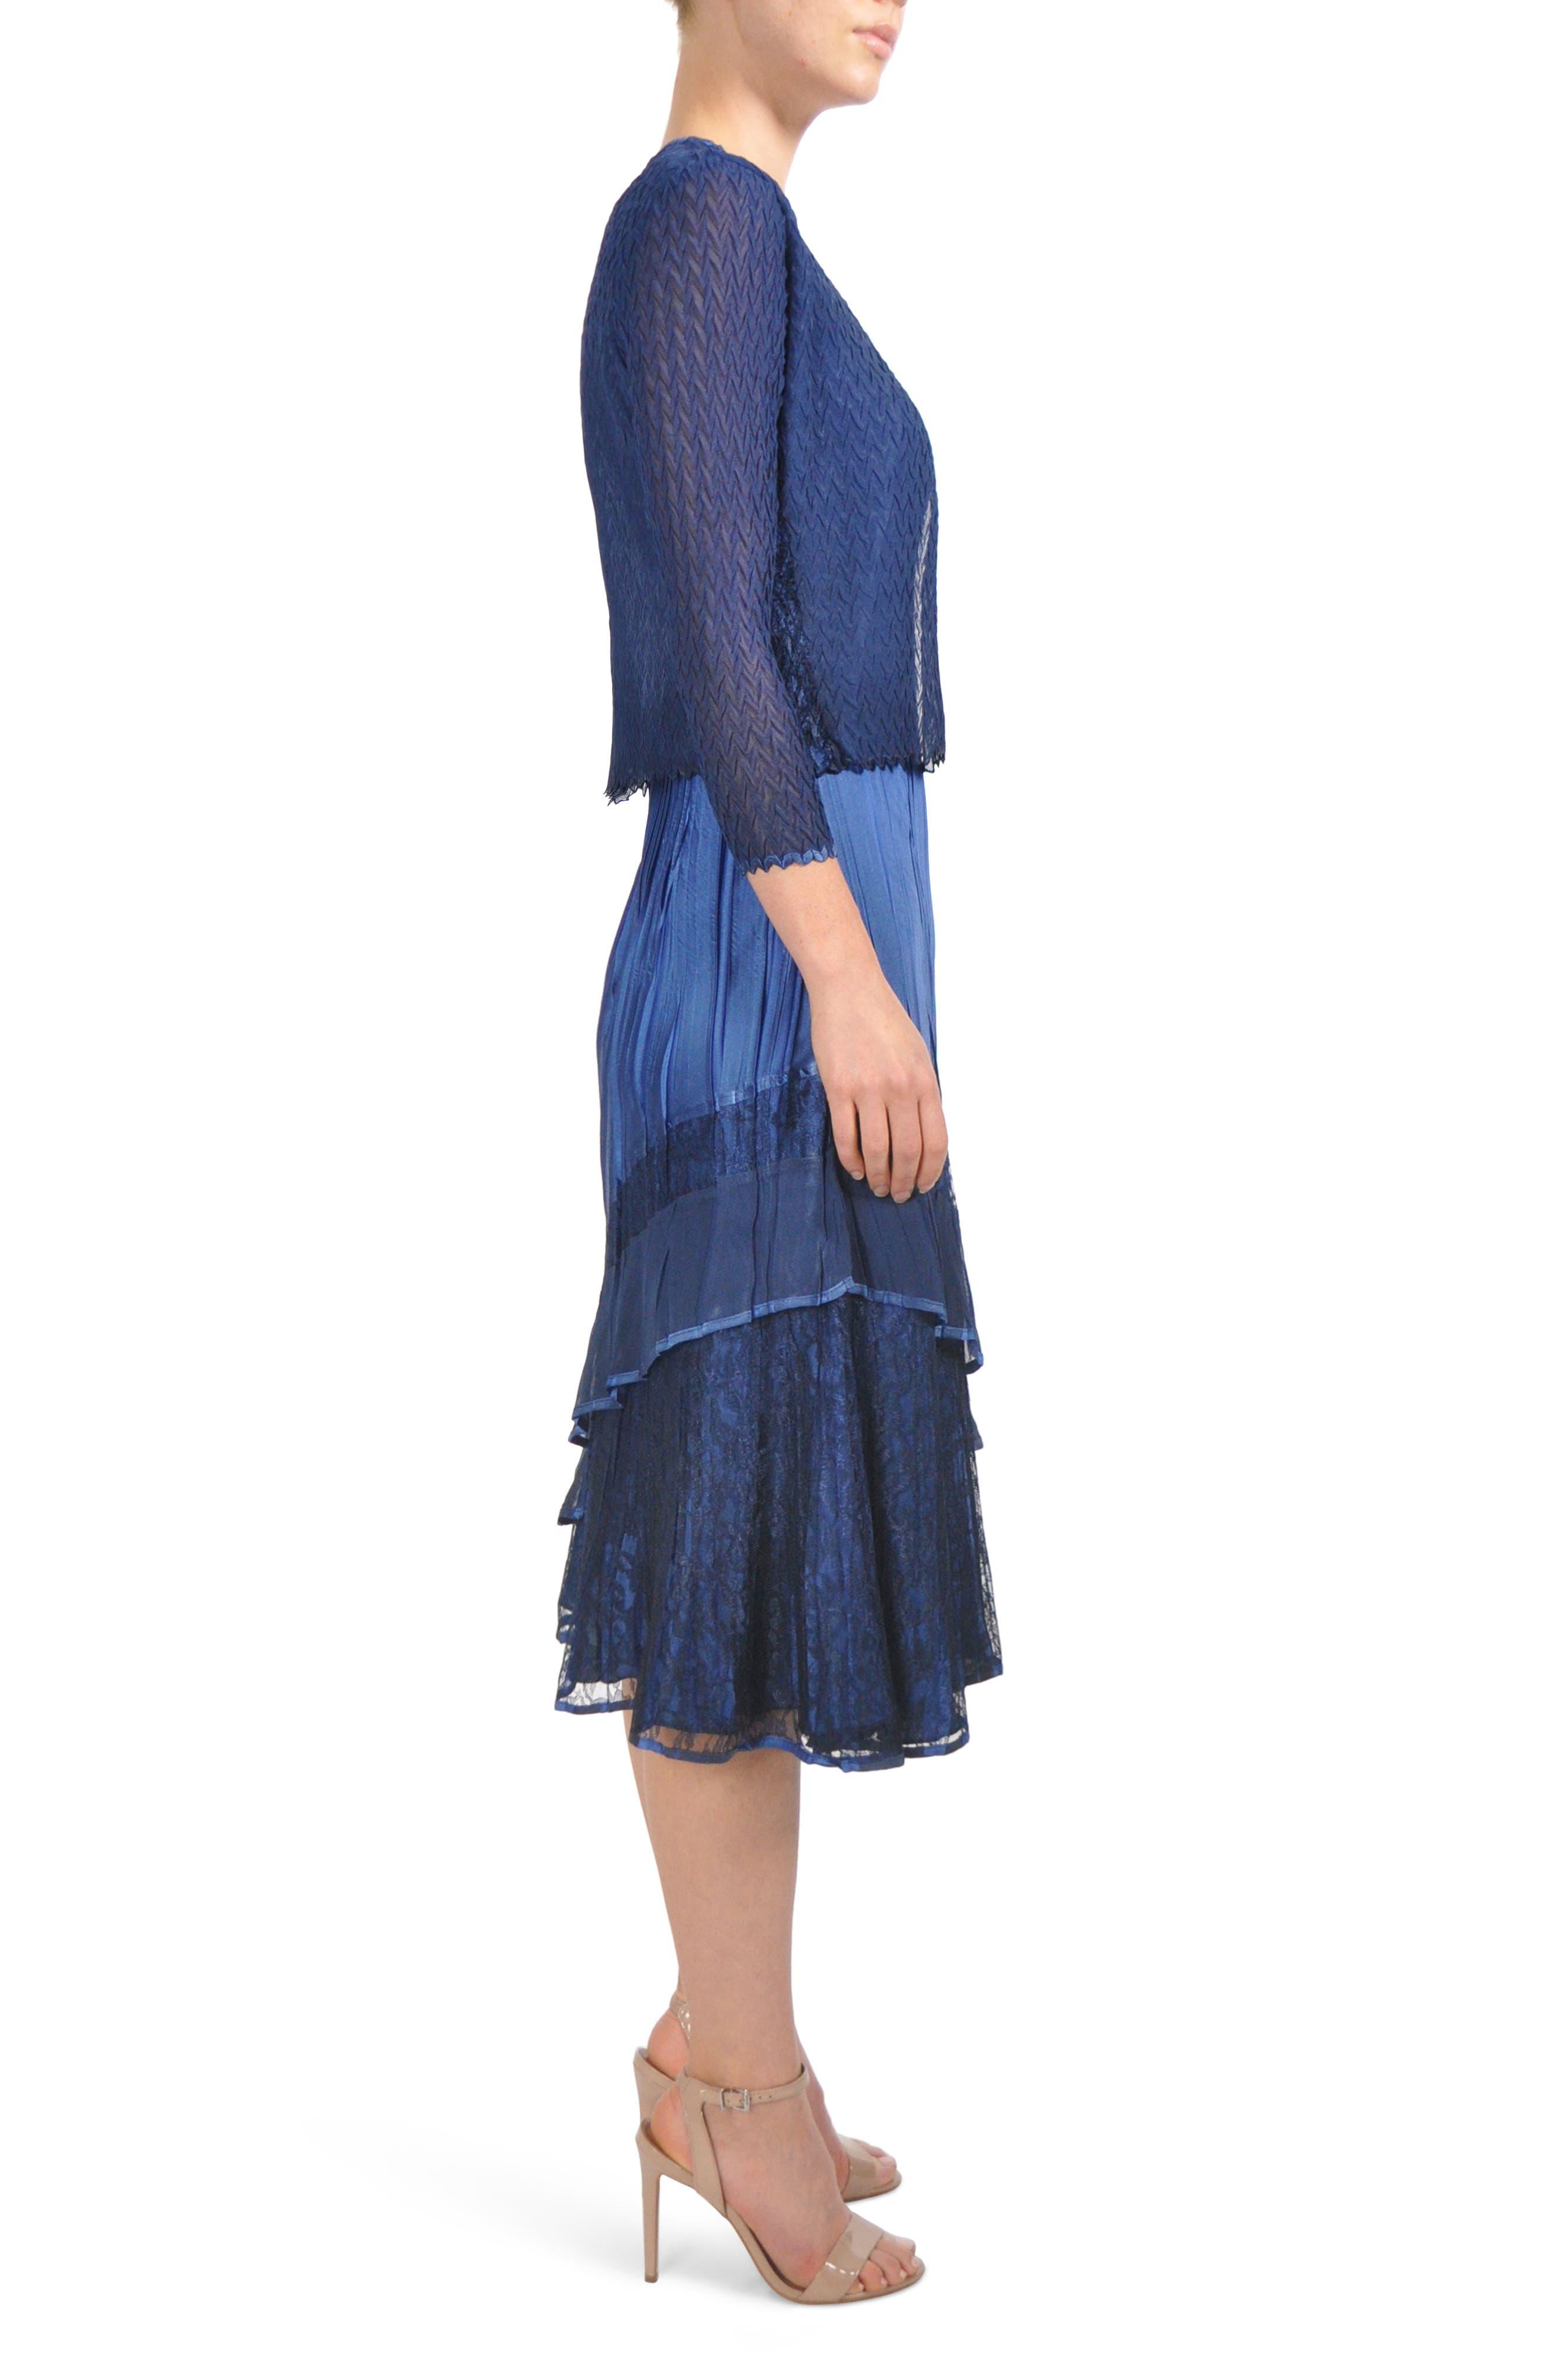 Komorov Midi Dress with Jacket,                             Alternate thumbnail 4, color,                             Navy Black Ombre